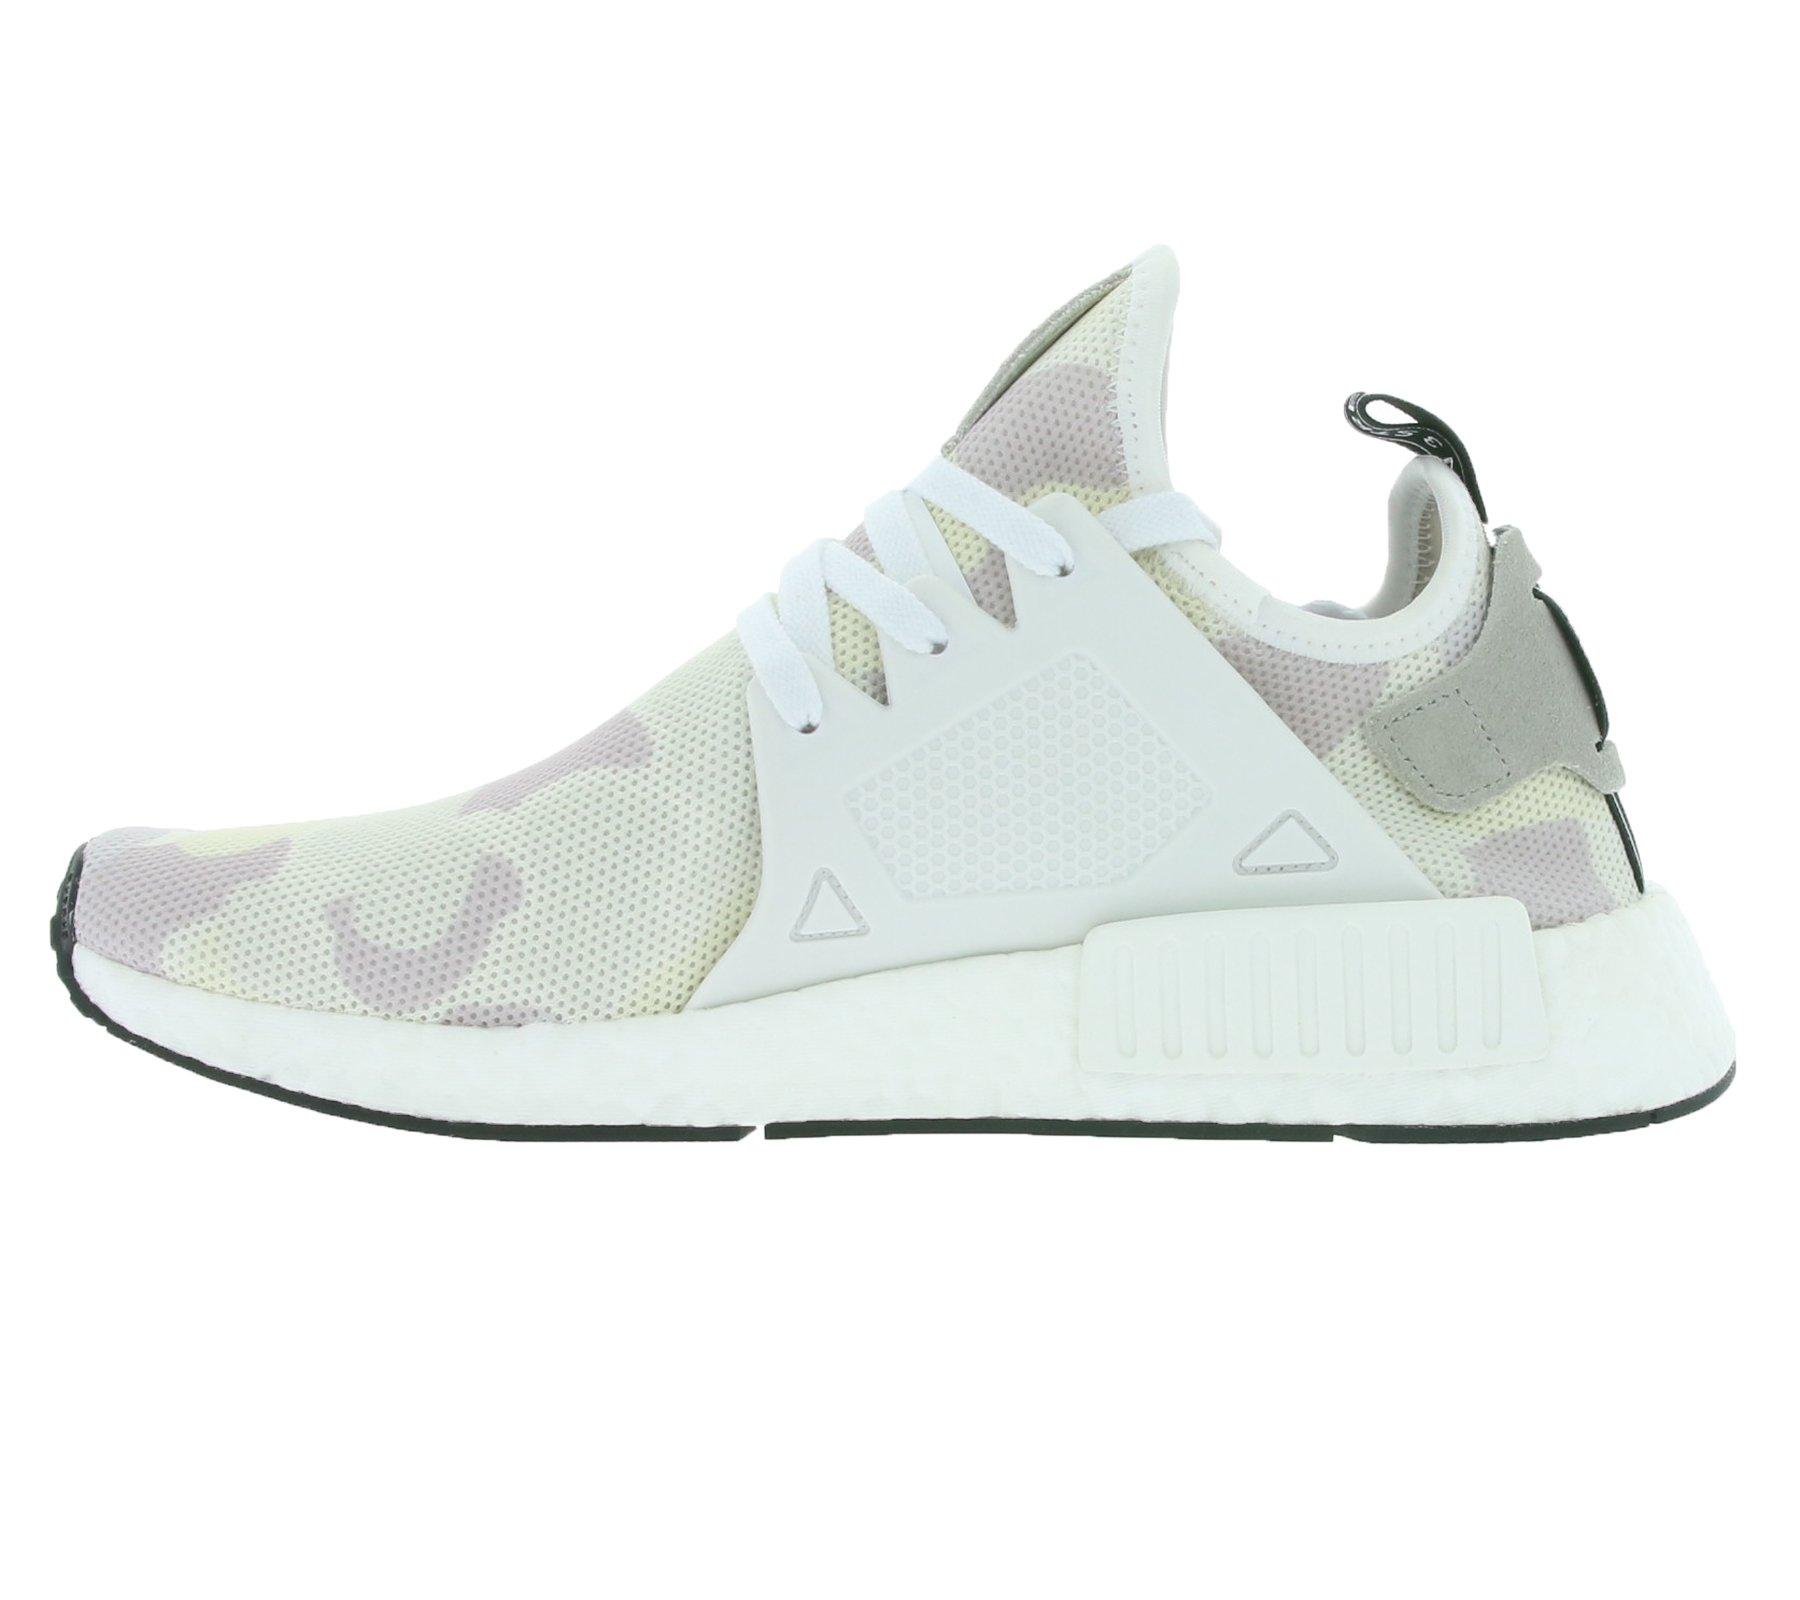 adidas Herren Schuhe / Sneaker NMD_XR1 weiß 46